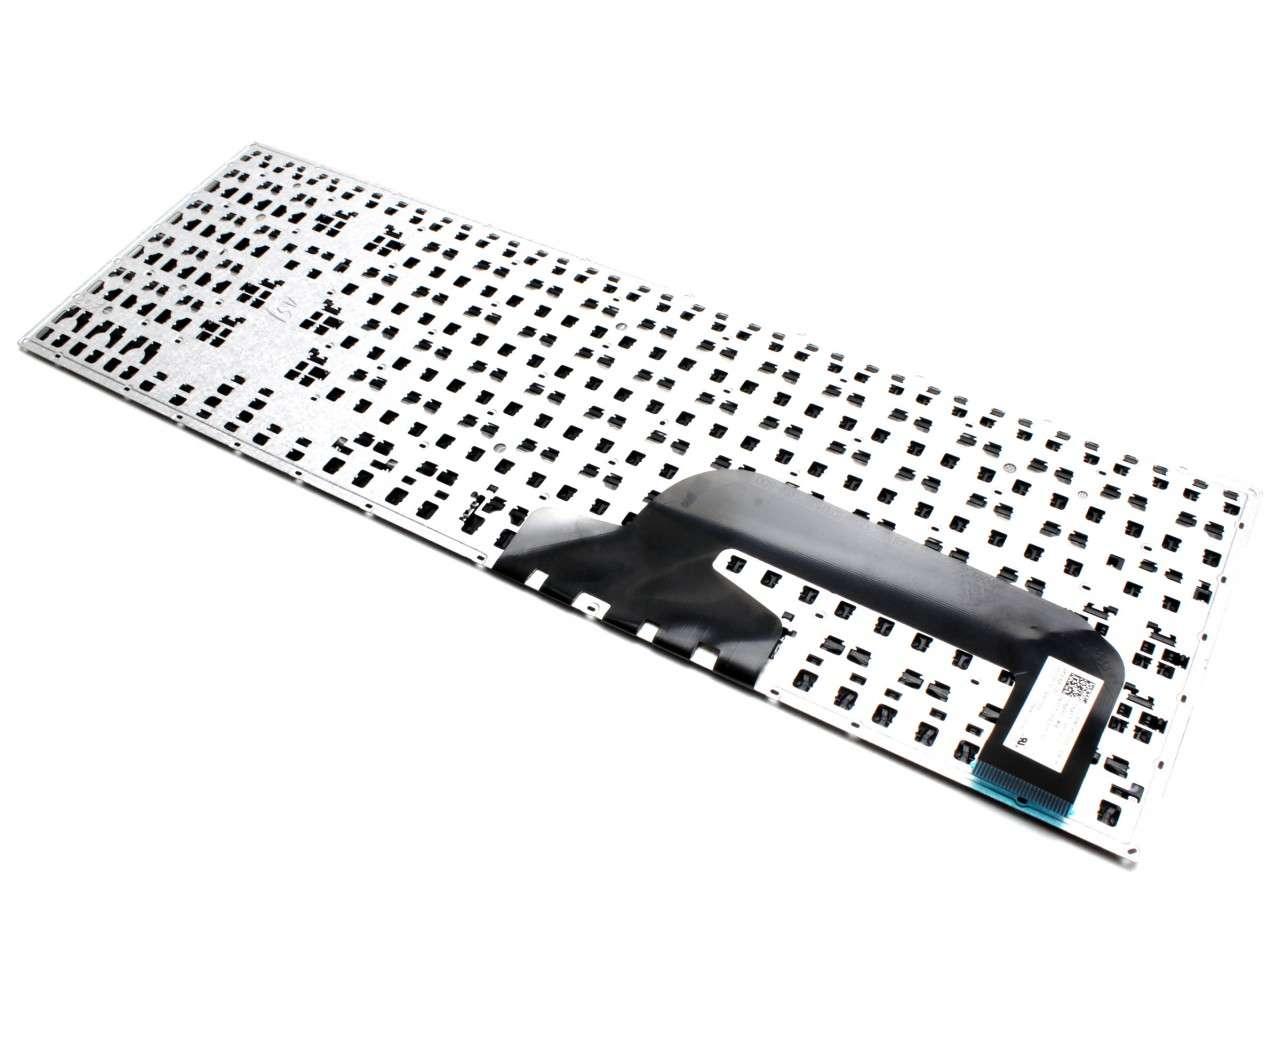 Tastatura Asus F507 layout US fara rama enter mic imagine